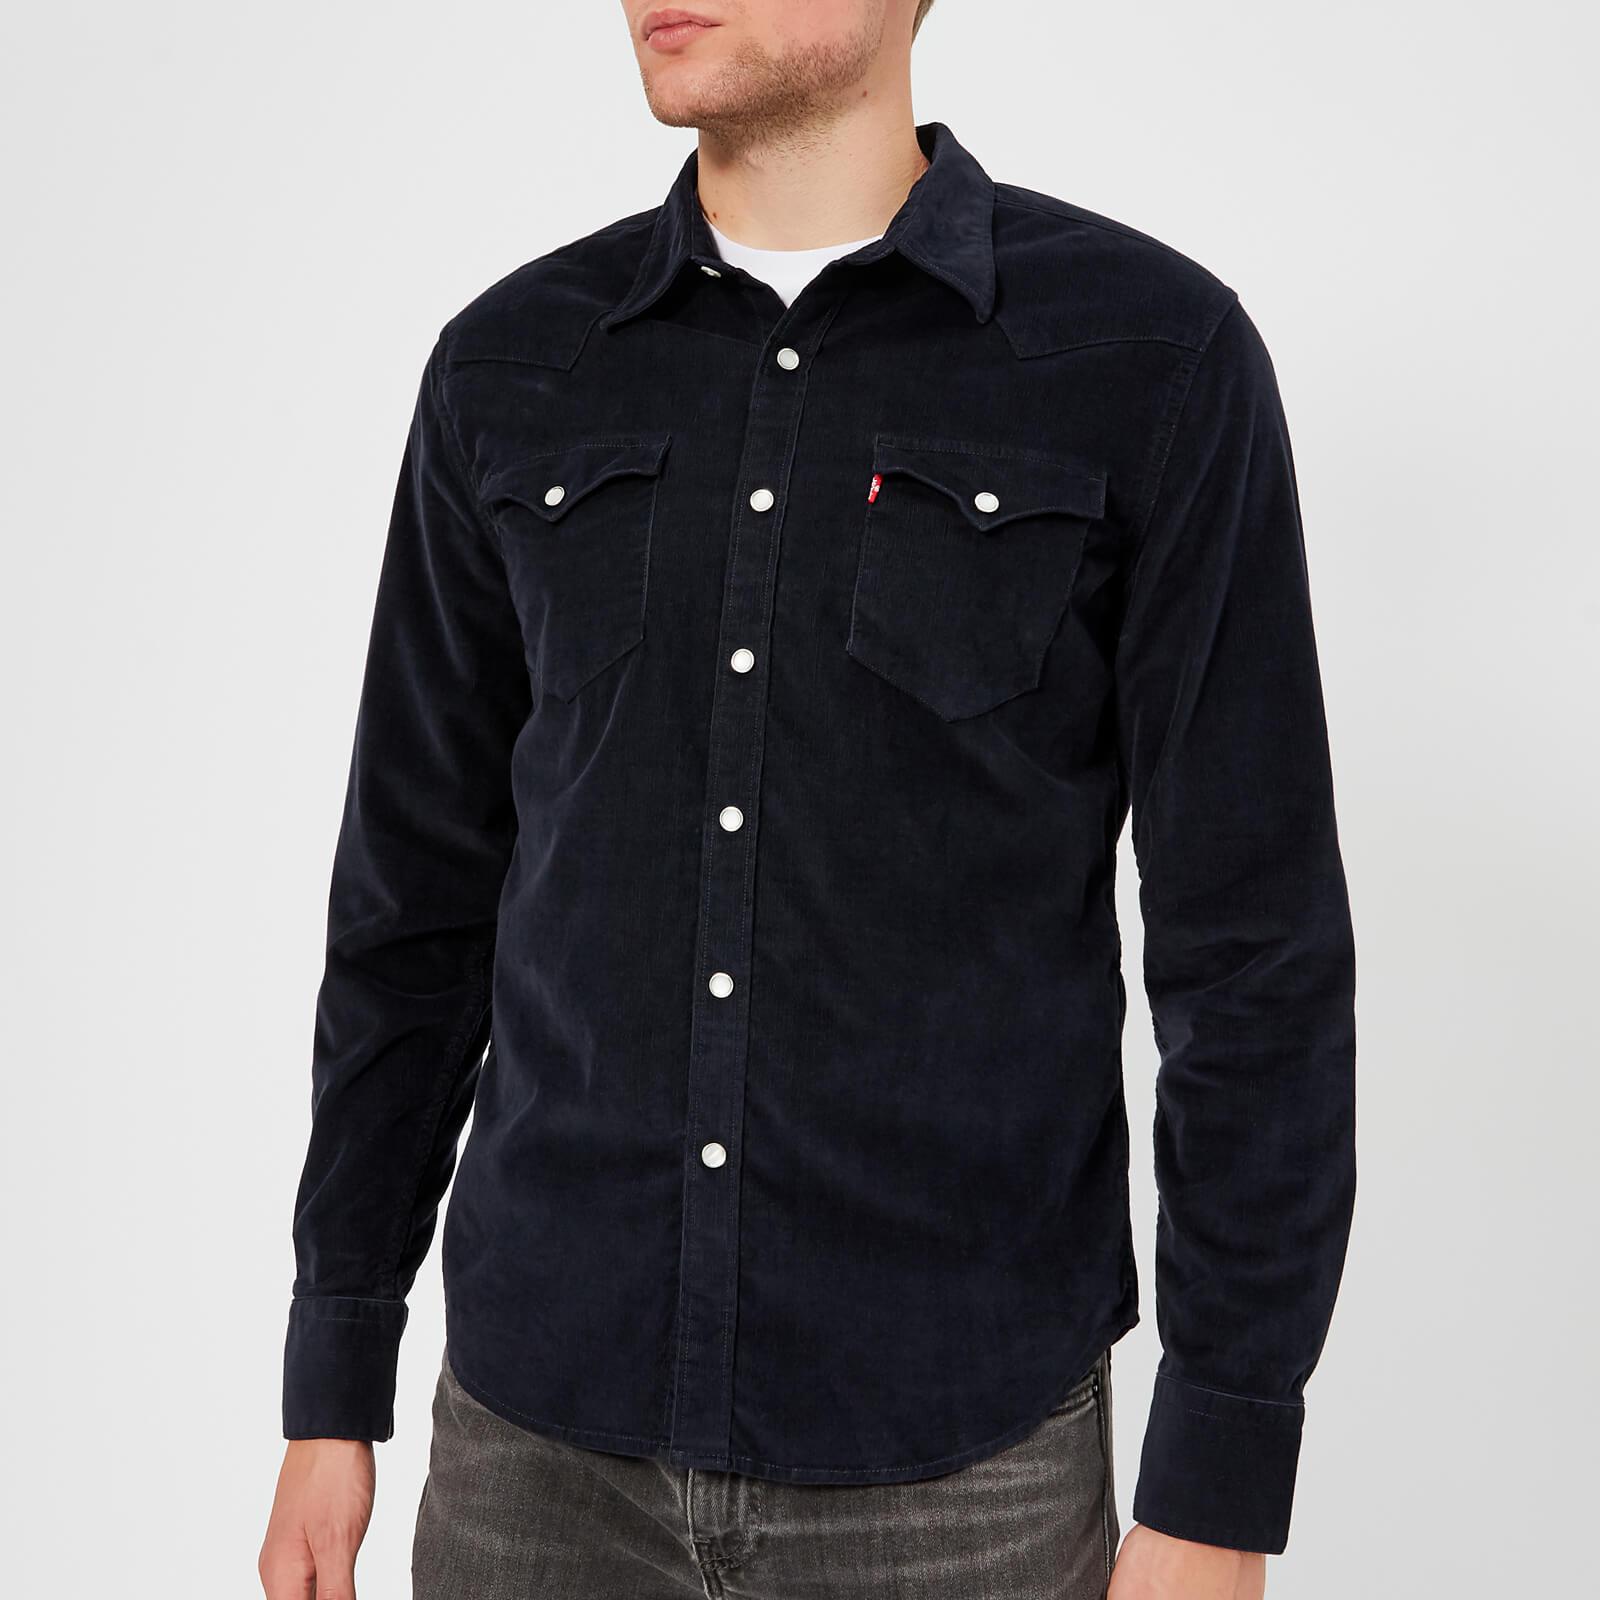 103953e0 Levis Mens Barstow Western Denim Shirt - DREAMWORKS